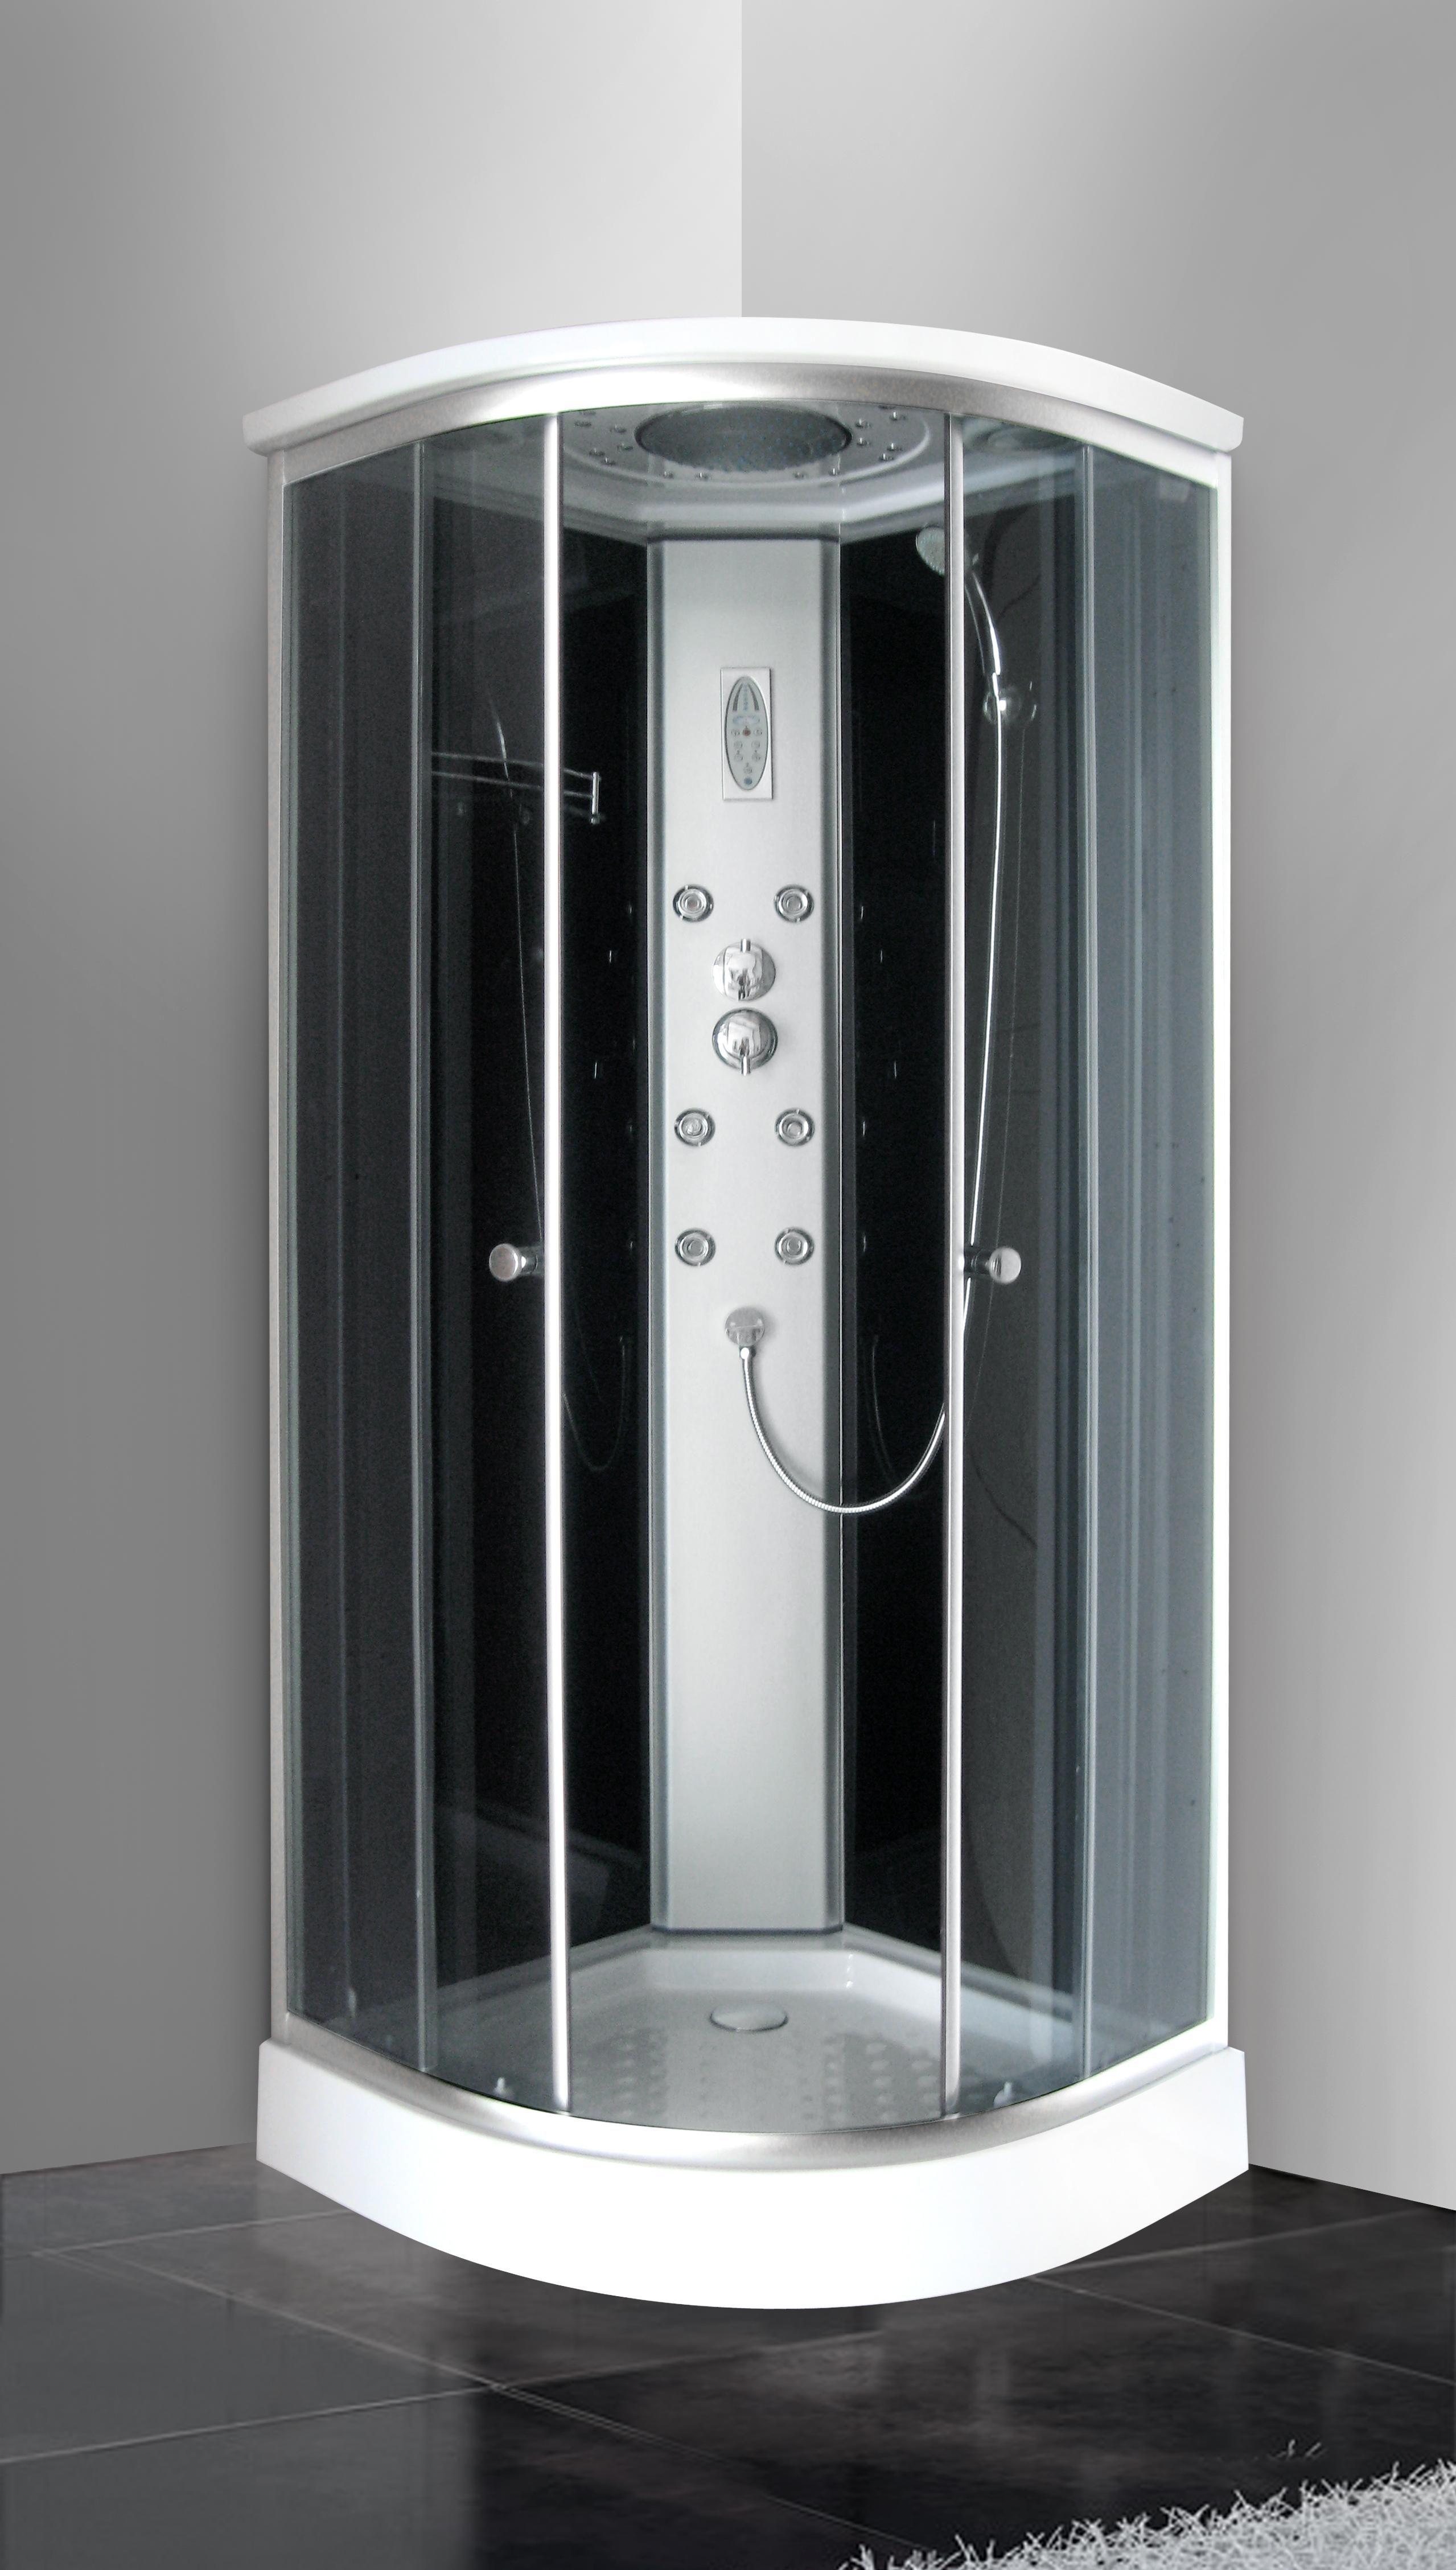 Cucina stile paris bianca for Cabine doccia prezzi